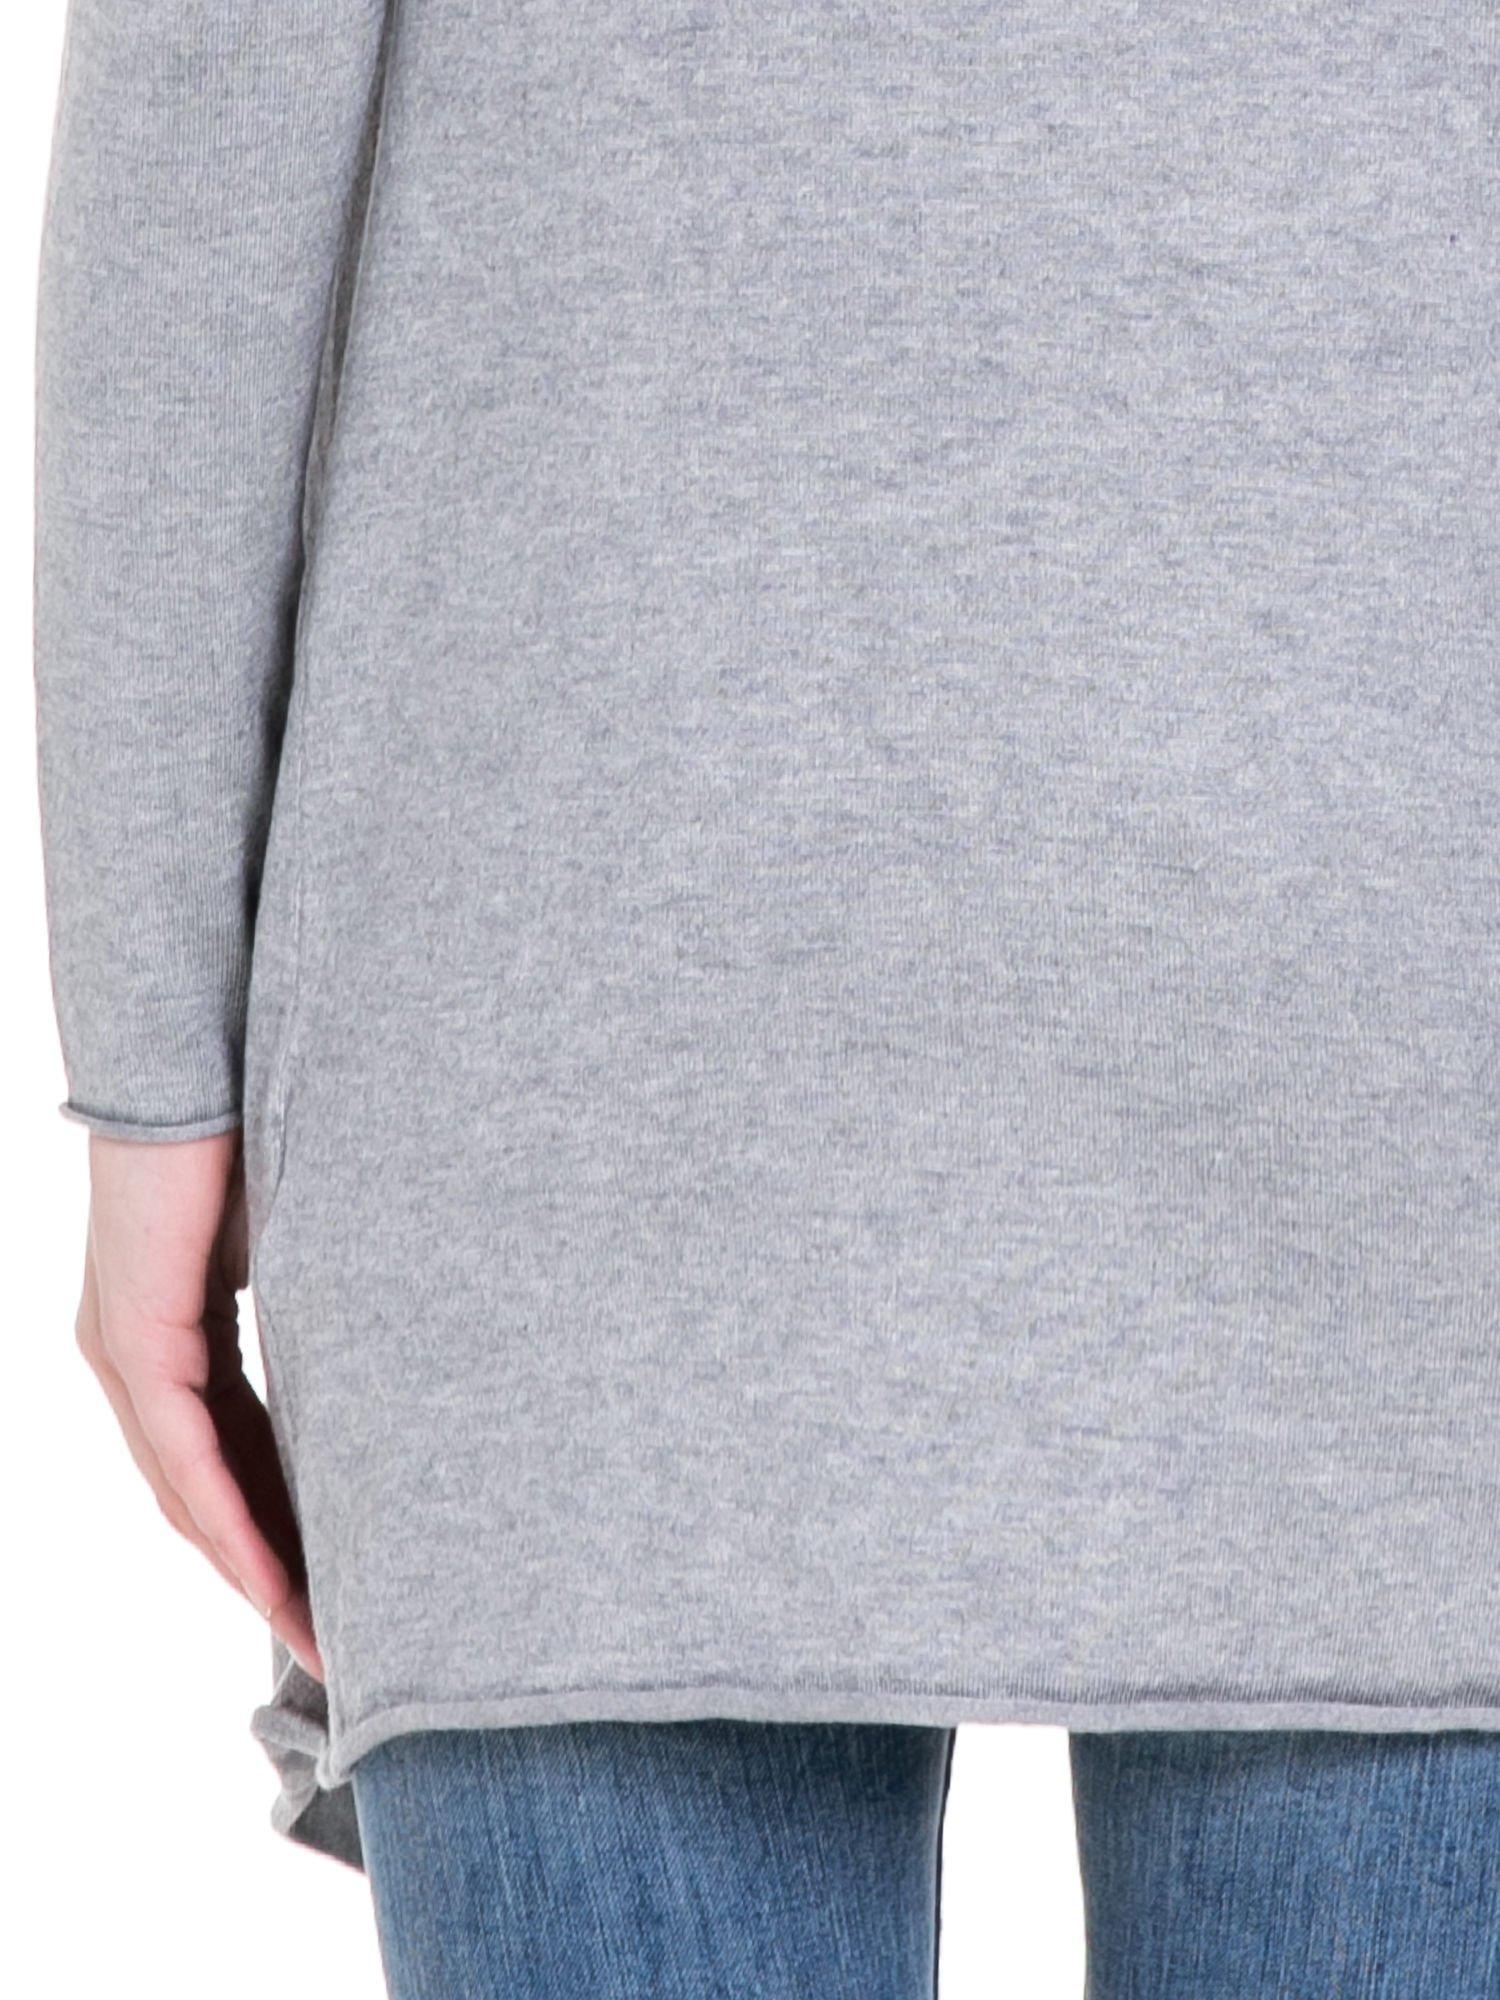 Szary sweter narzutka o kroju waterfall                                  zdj.                                  8